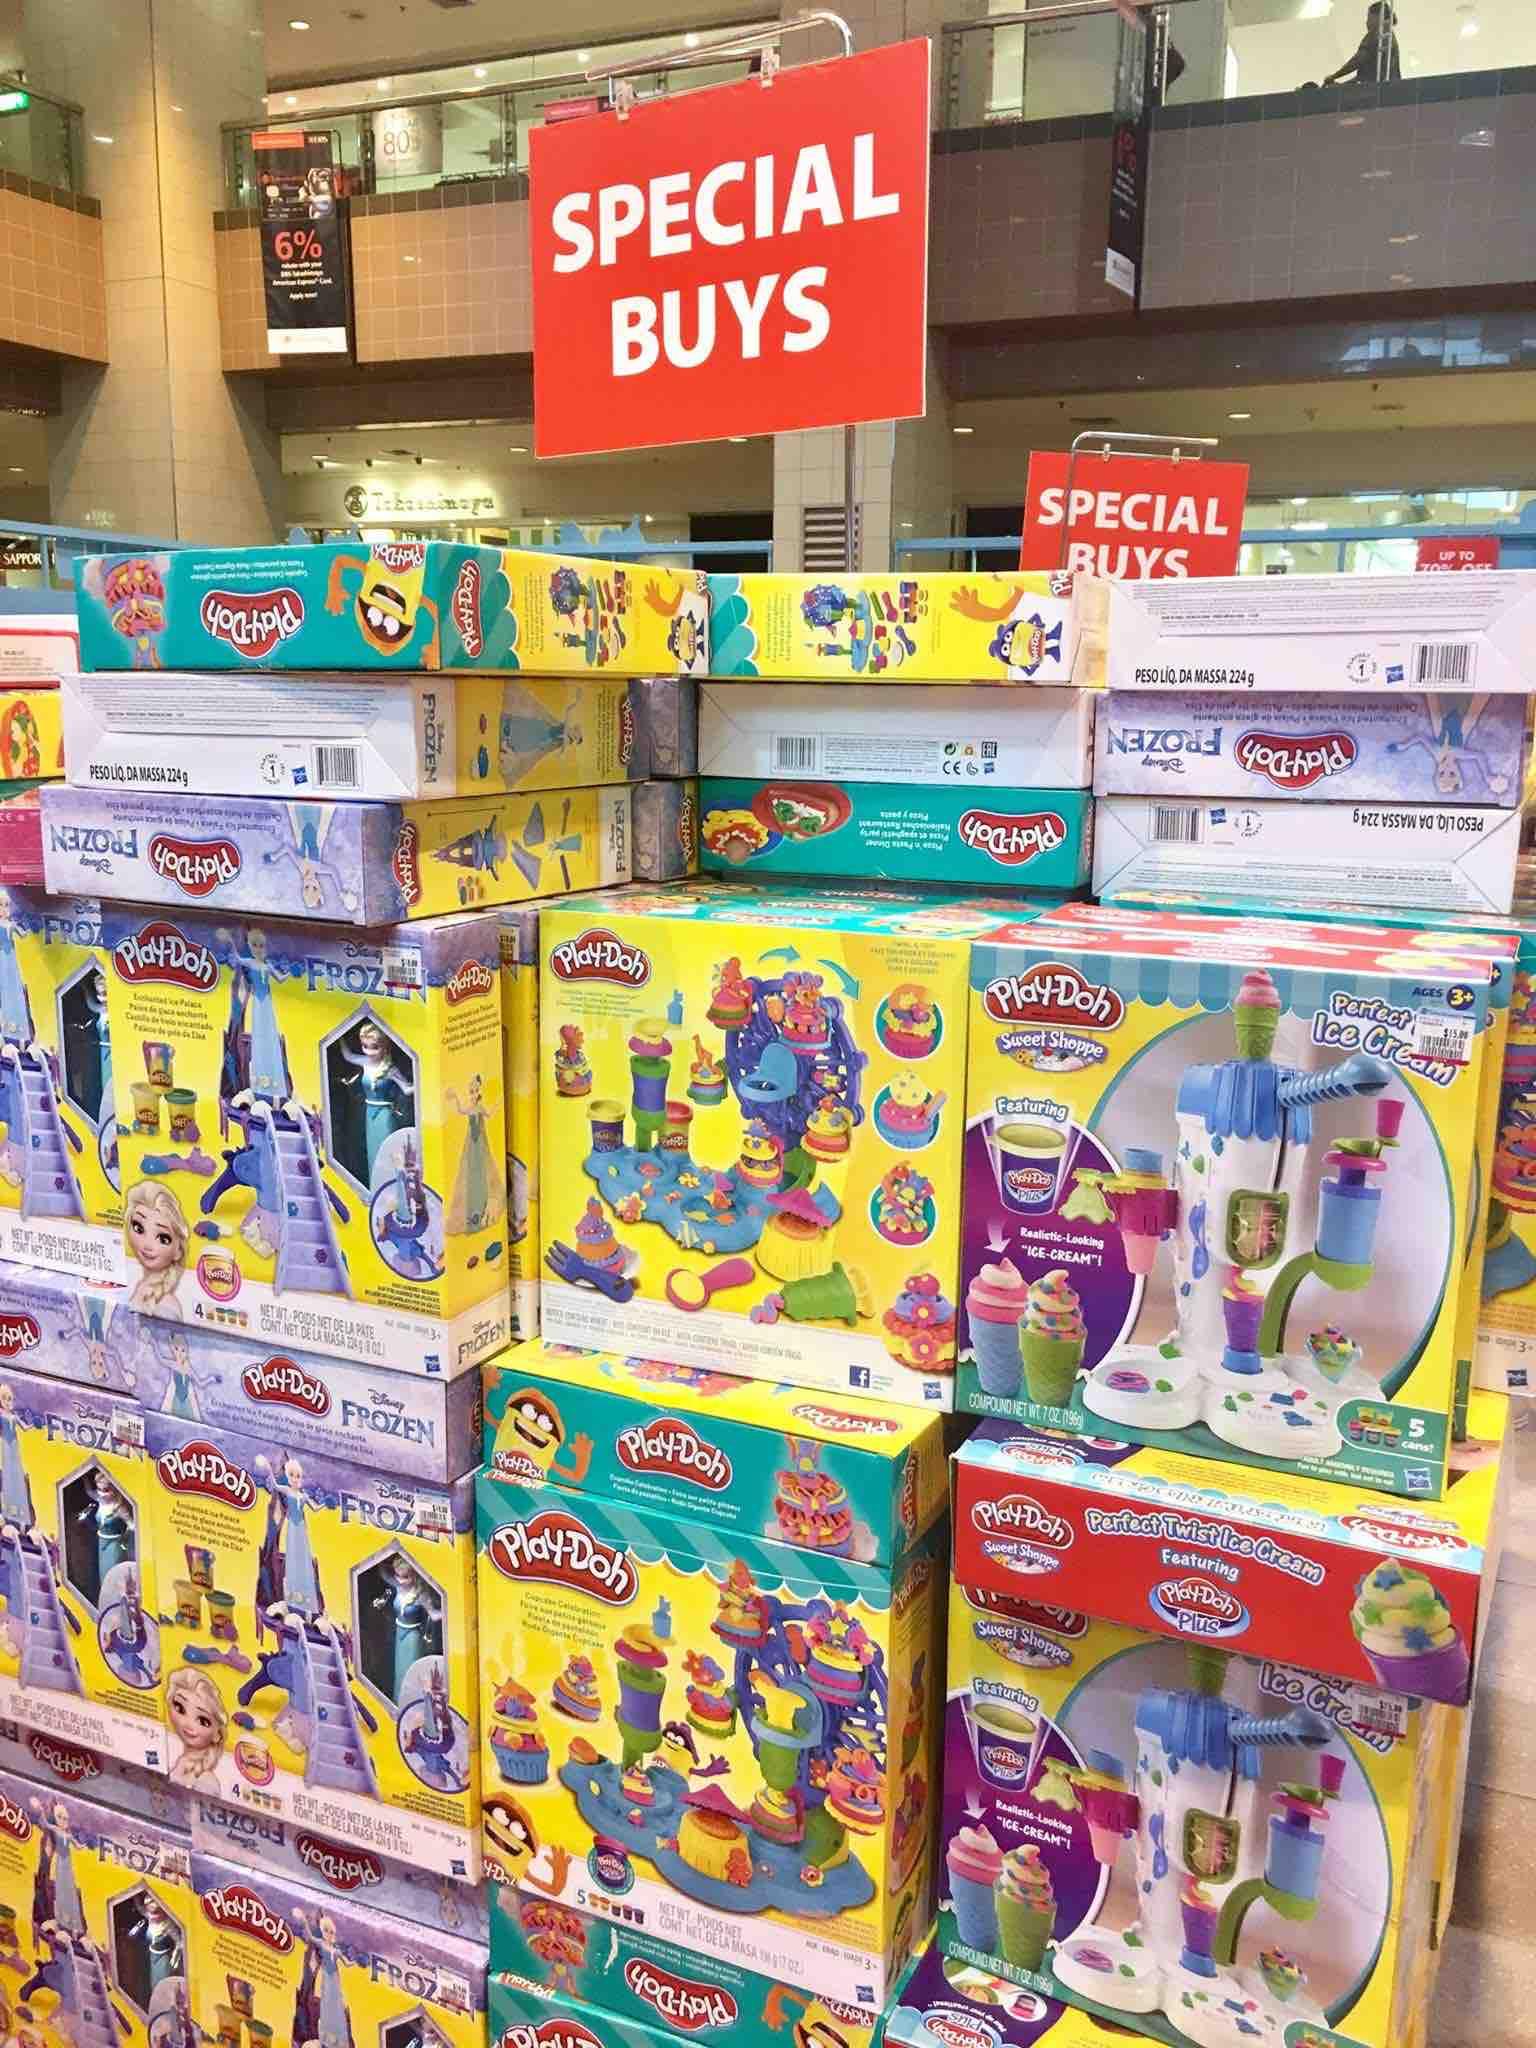 Takashimaya Singapore 21st Craziest Toys Sale Promotion 28 Jul - 6 Aug 2017   Why Not Deals 19 & Promotions